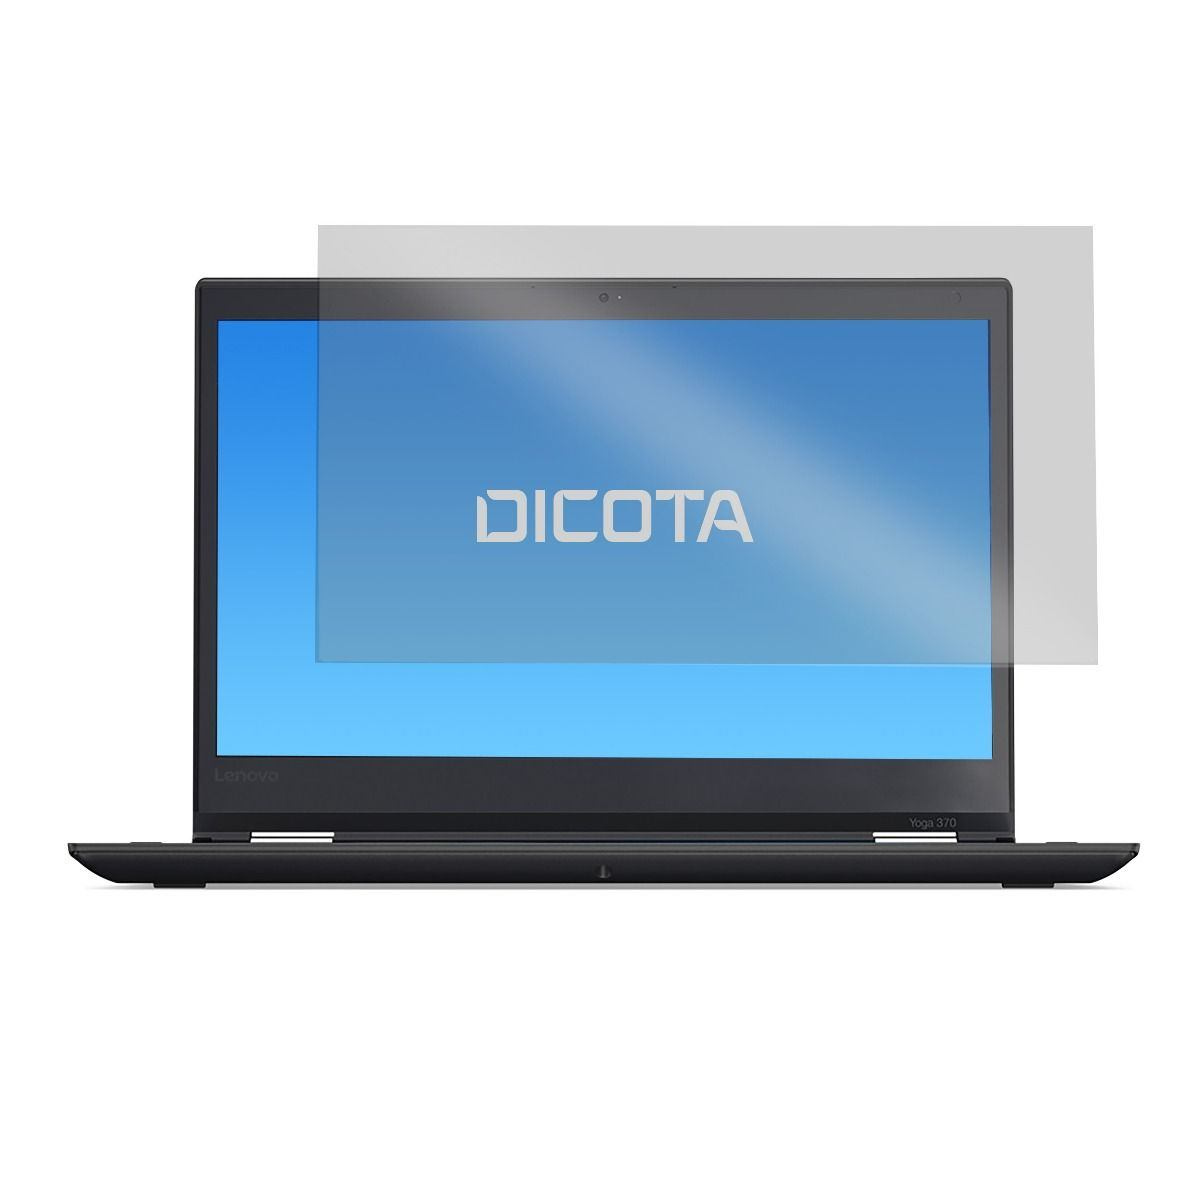 2022026-Dicota-D31490-schermo-anti-riflesso-33-8-cm-13-3-DICOTA-Secret-2-Way